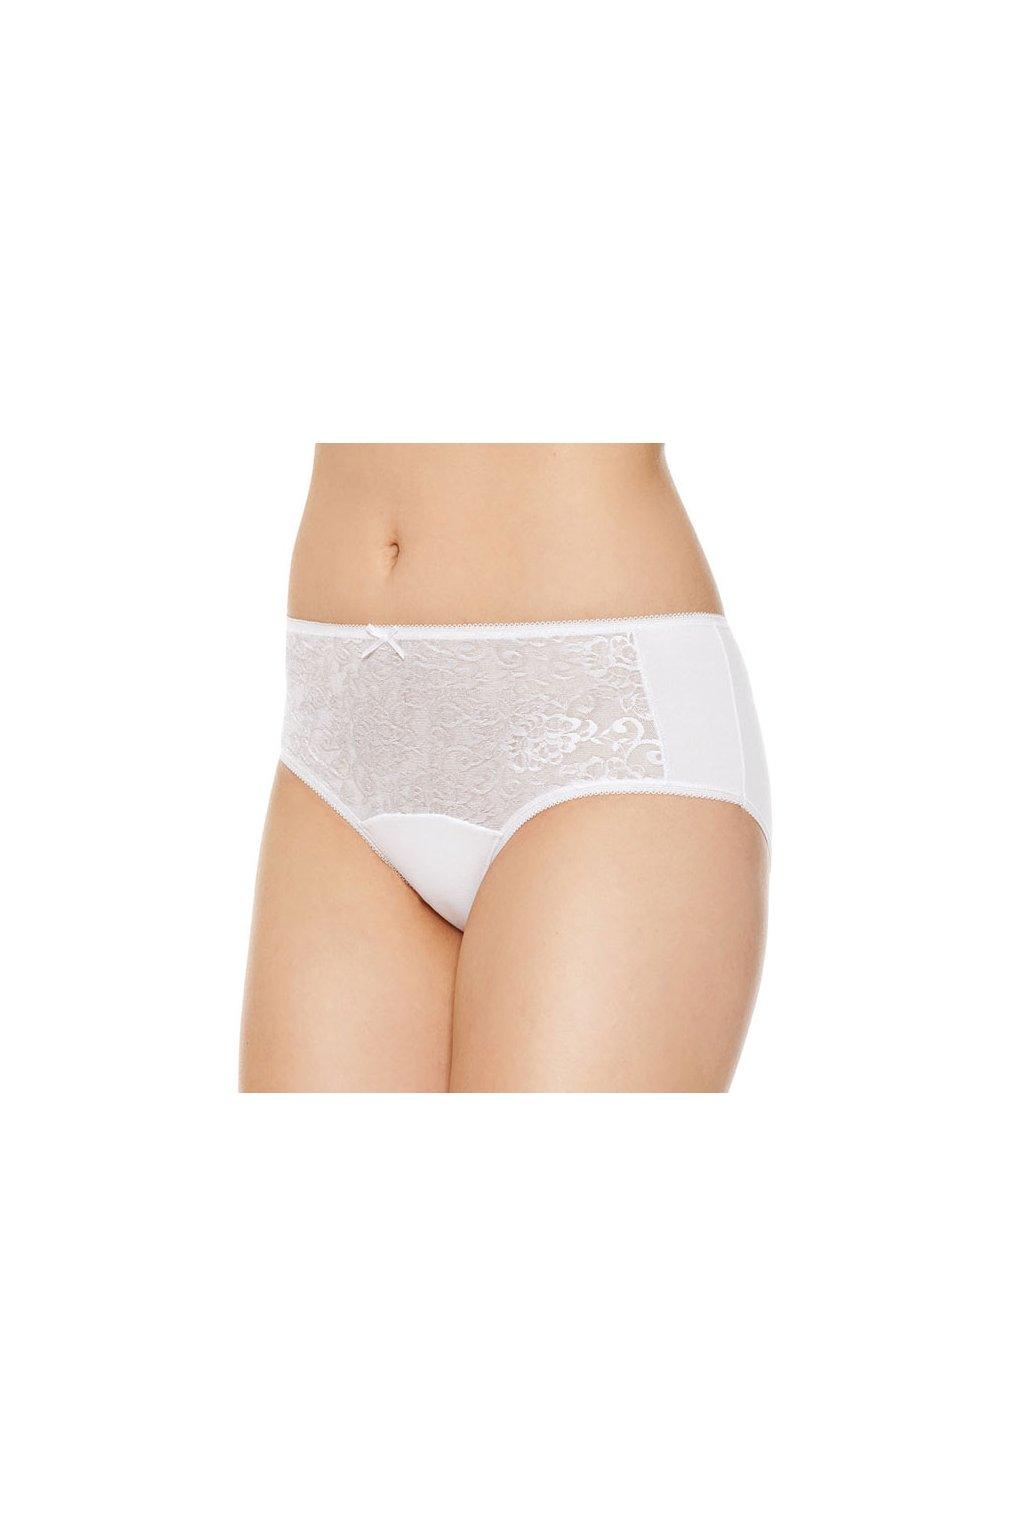 Dámské kalhotky, 100141 1, bílá